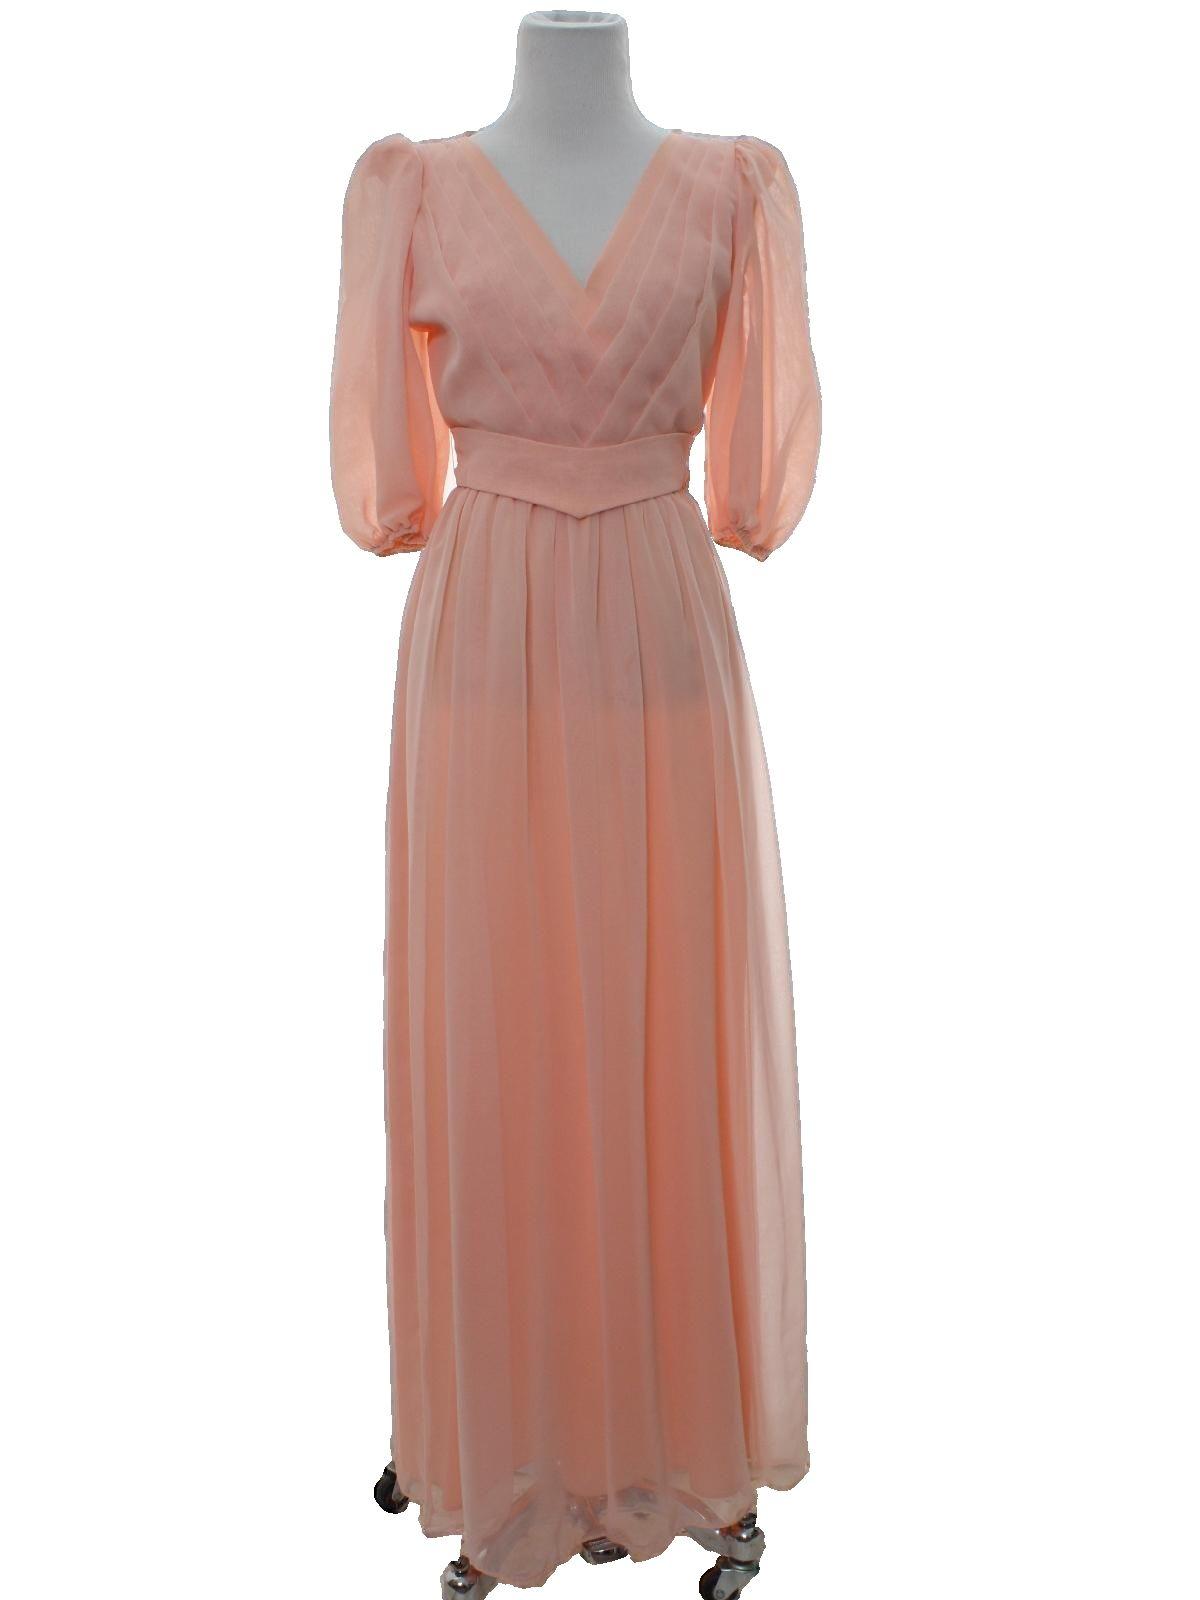 Rustyzipper Com Vintage Clothing Maxi Dress Cocktail 70s Prom Dress Dresses [ 1600 x 1200 Pixel ]